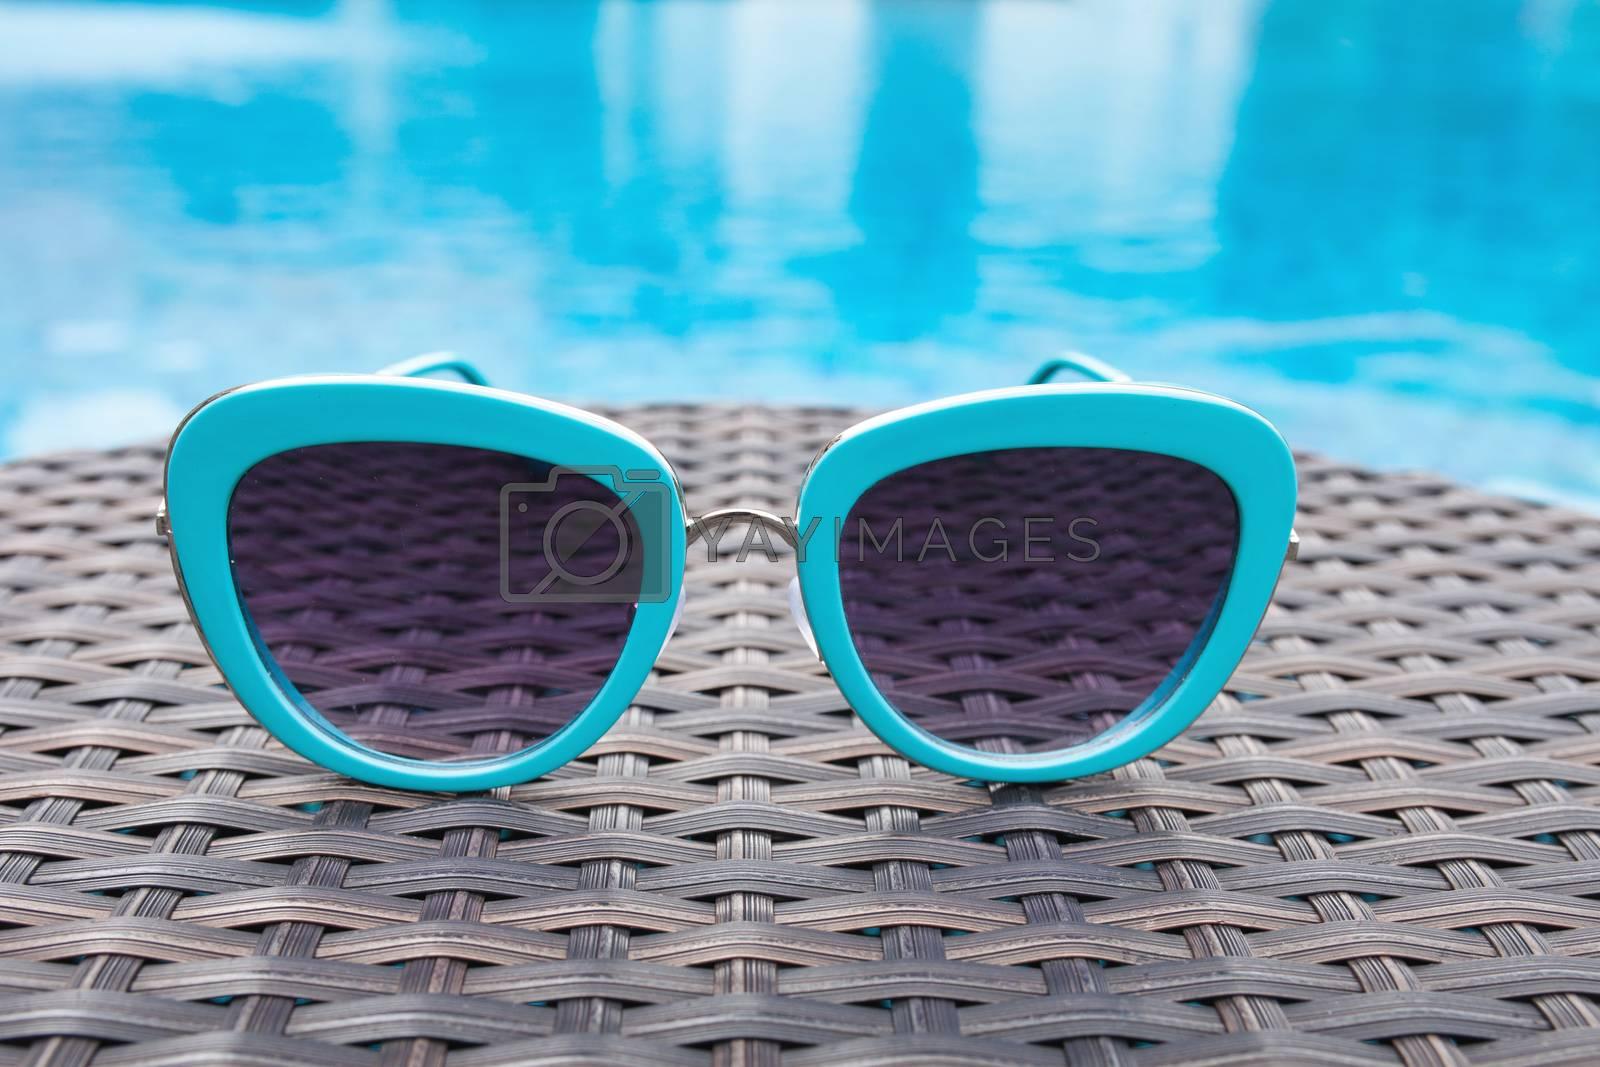 Summertime sunglasses relax near swimming pool.